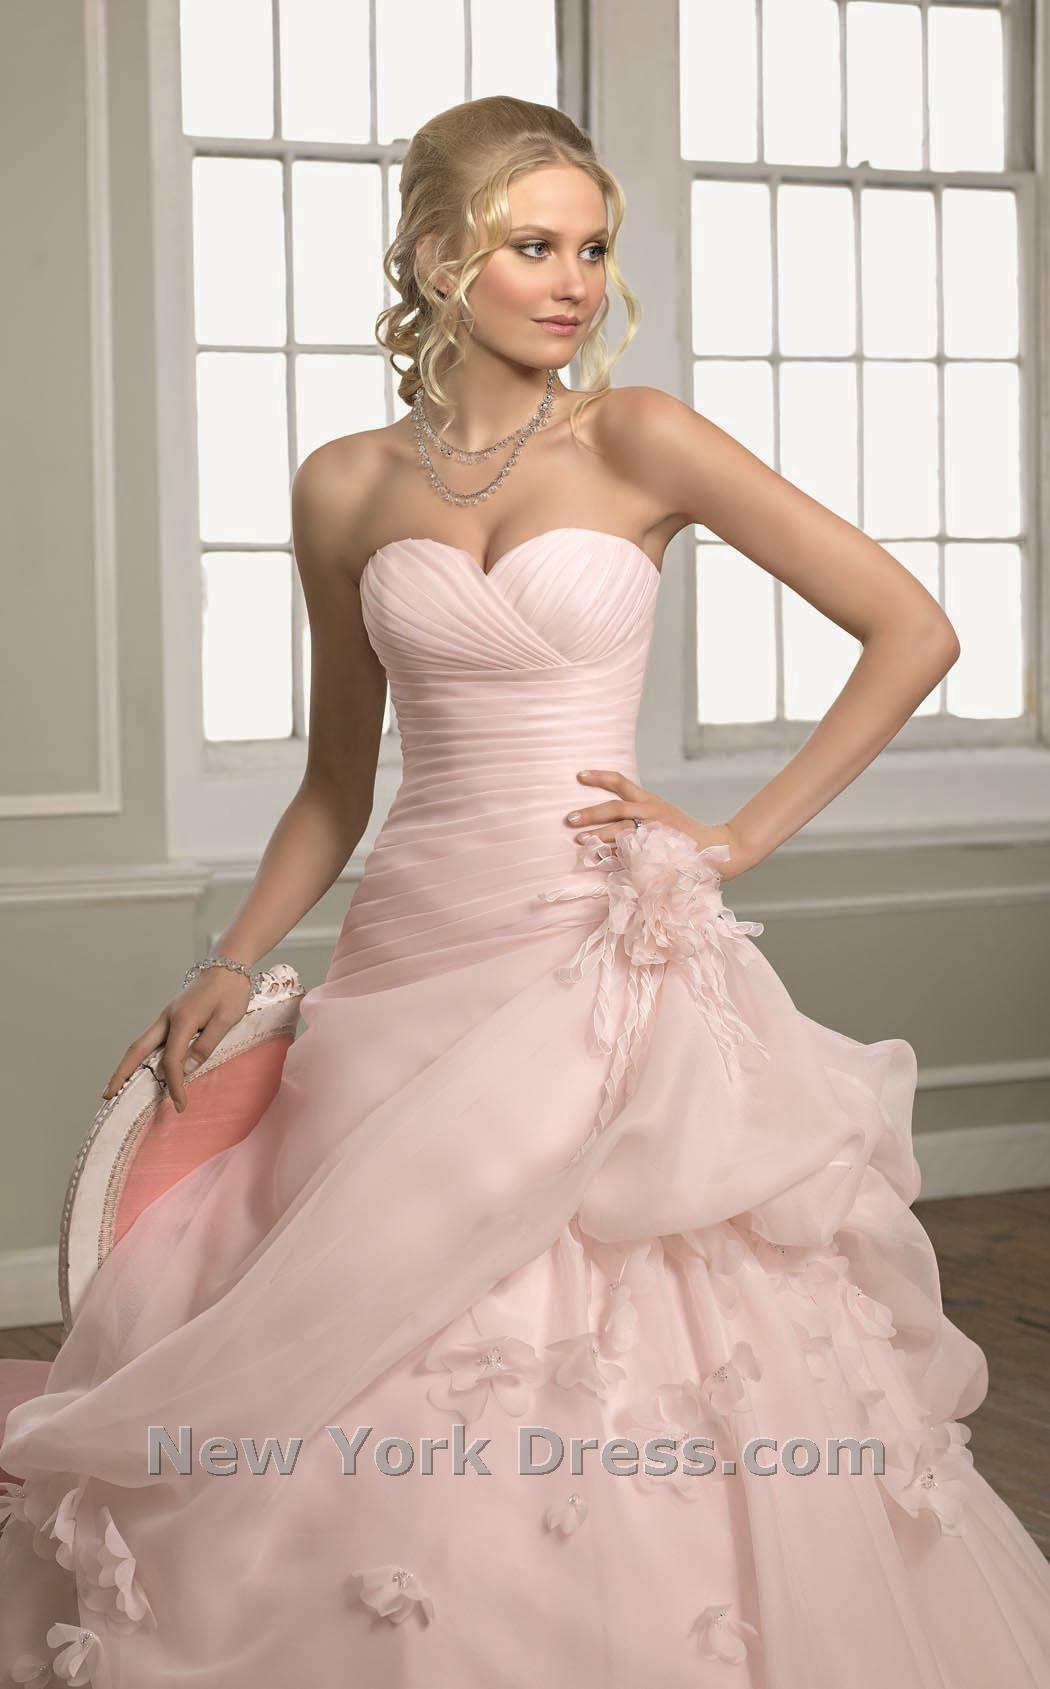 Blush wedding dress | De largo | Pinterest | Novios